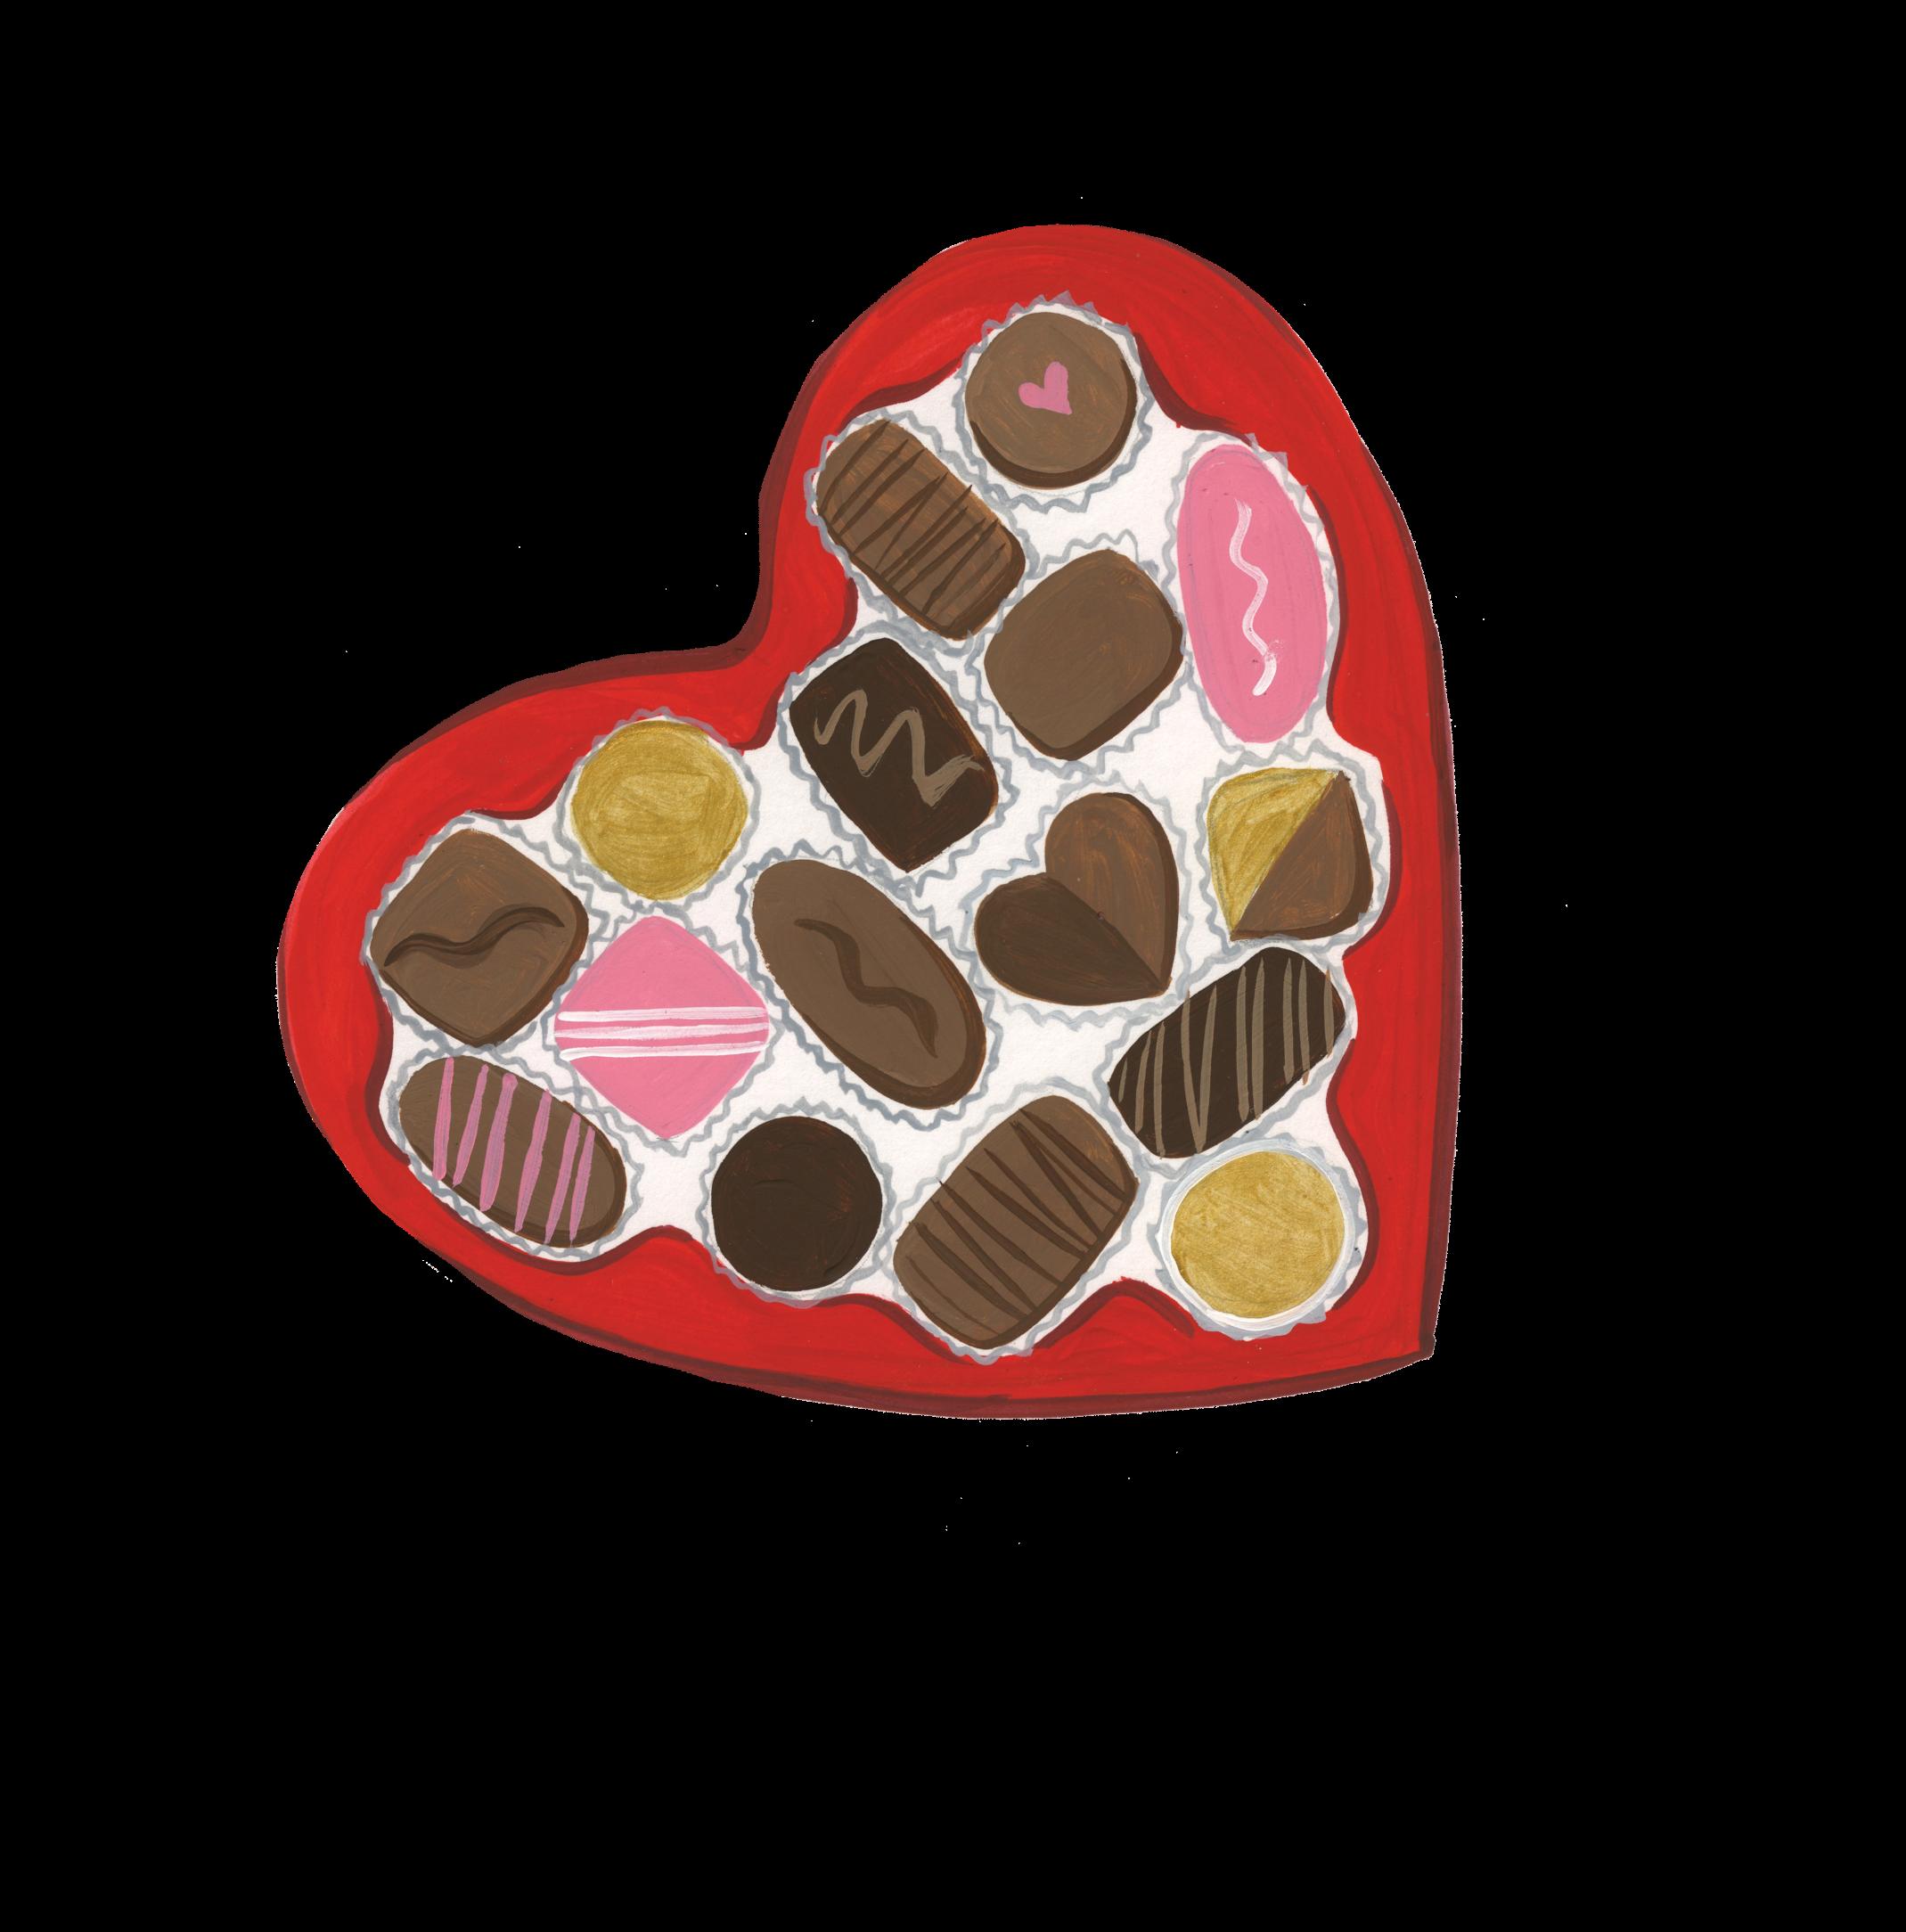 Be My Valentine Chocolates Print & Cut Files